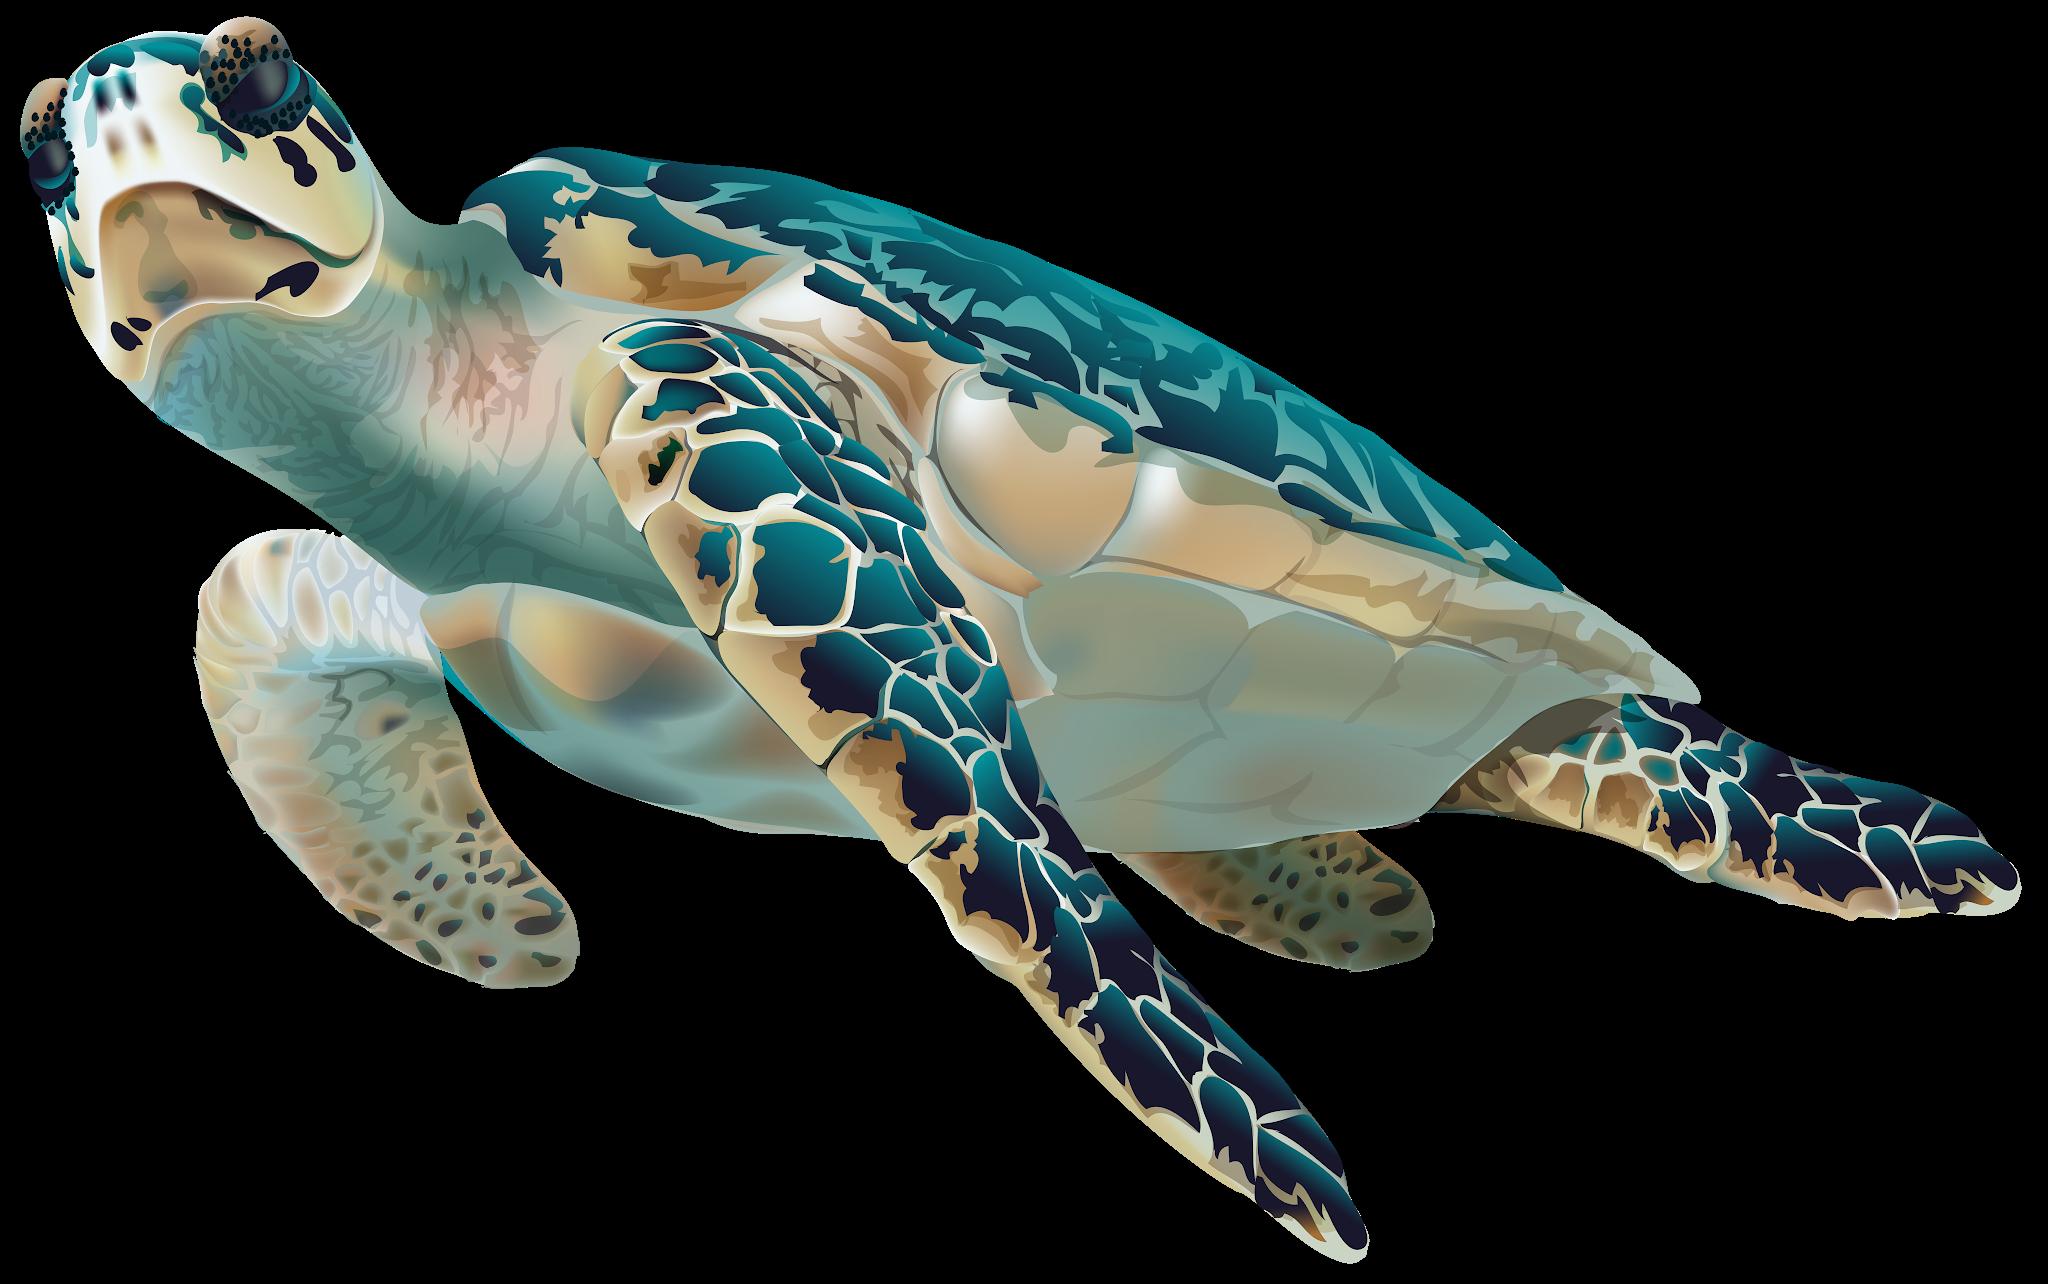 Sea Turtle Cartoon Turtle Png Image And Clipart Turtle Sea Turtle Cartoon Turtle